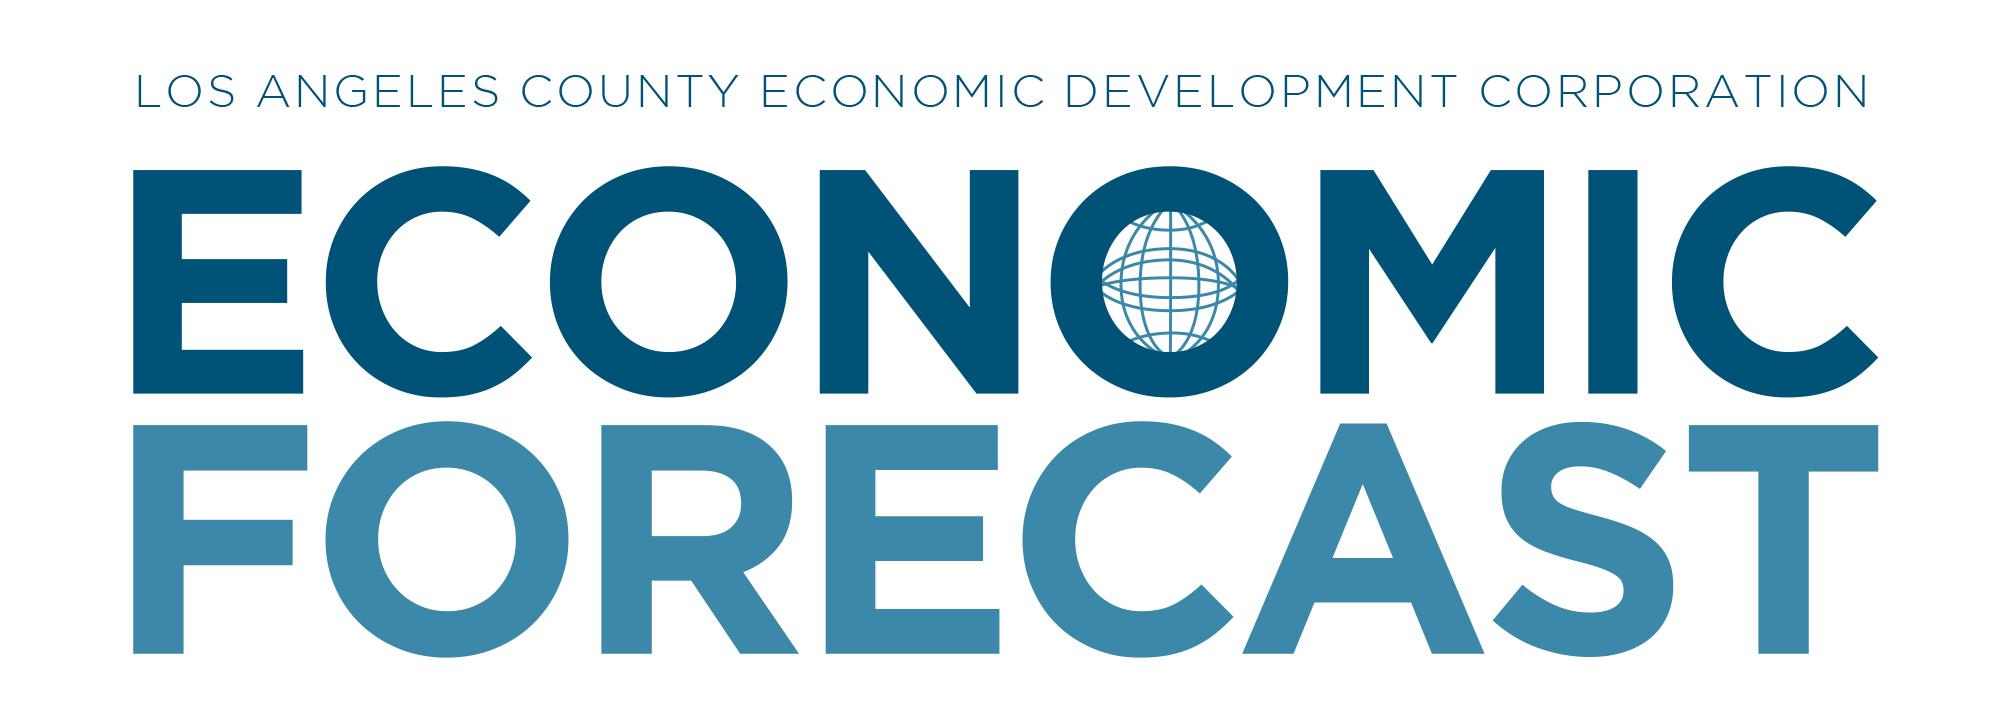 LAEDC Feburary Economic Forecast